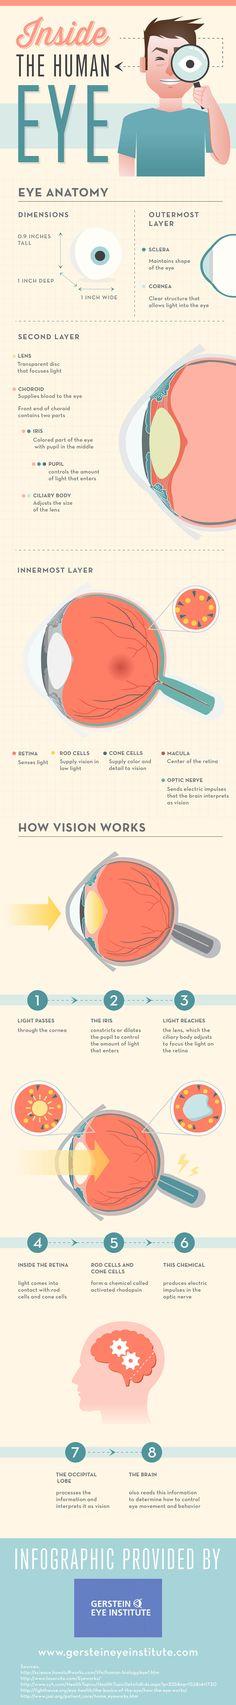 Inside The Human Eye Infographic Optometry Laser Eye Surgery Cost, Eye Anatomy, Human Anatomy, Eye Facts, Eye Sight Improvement, Healthy Eyes, Human Eye, Human Body, Medical Information